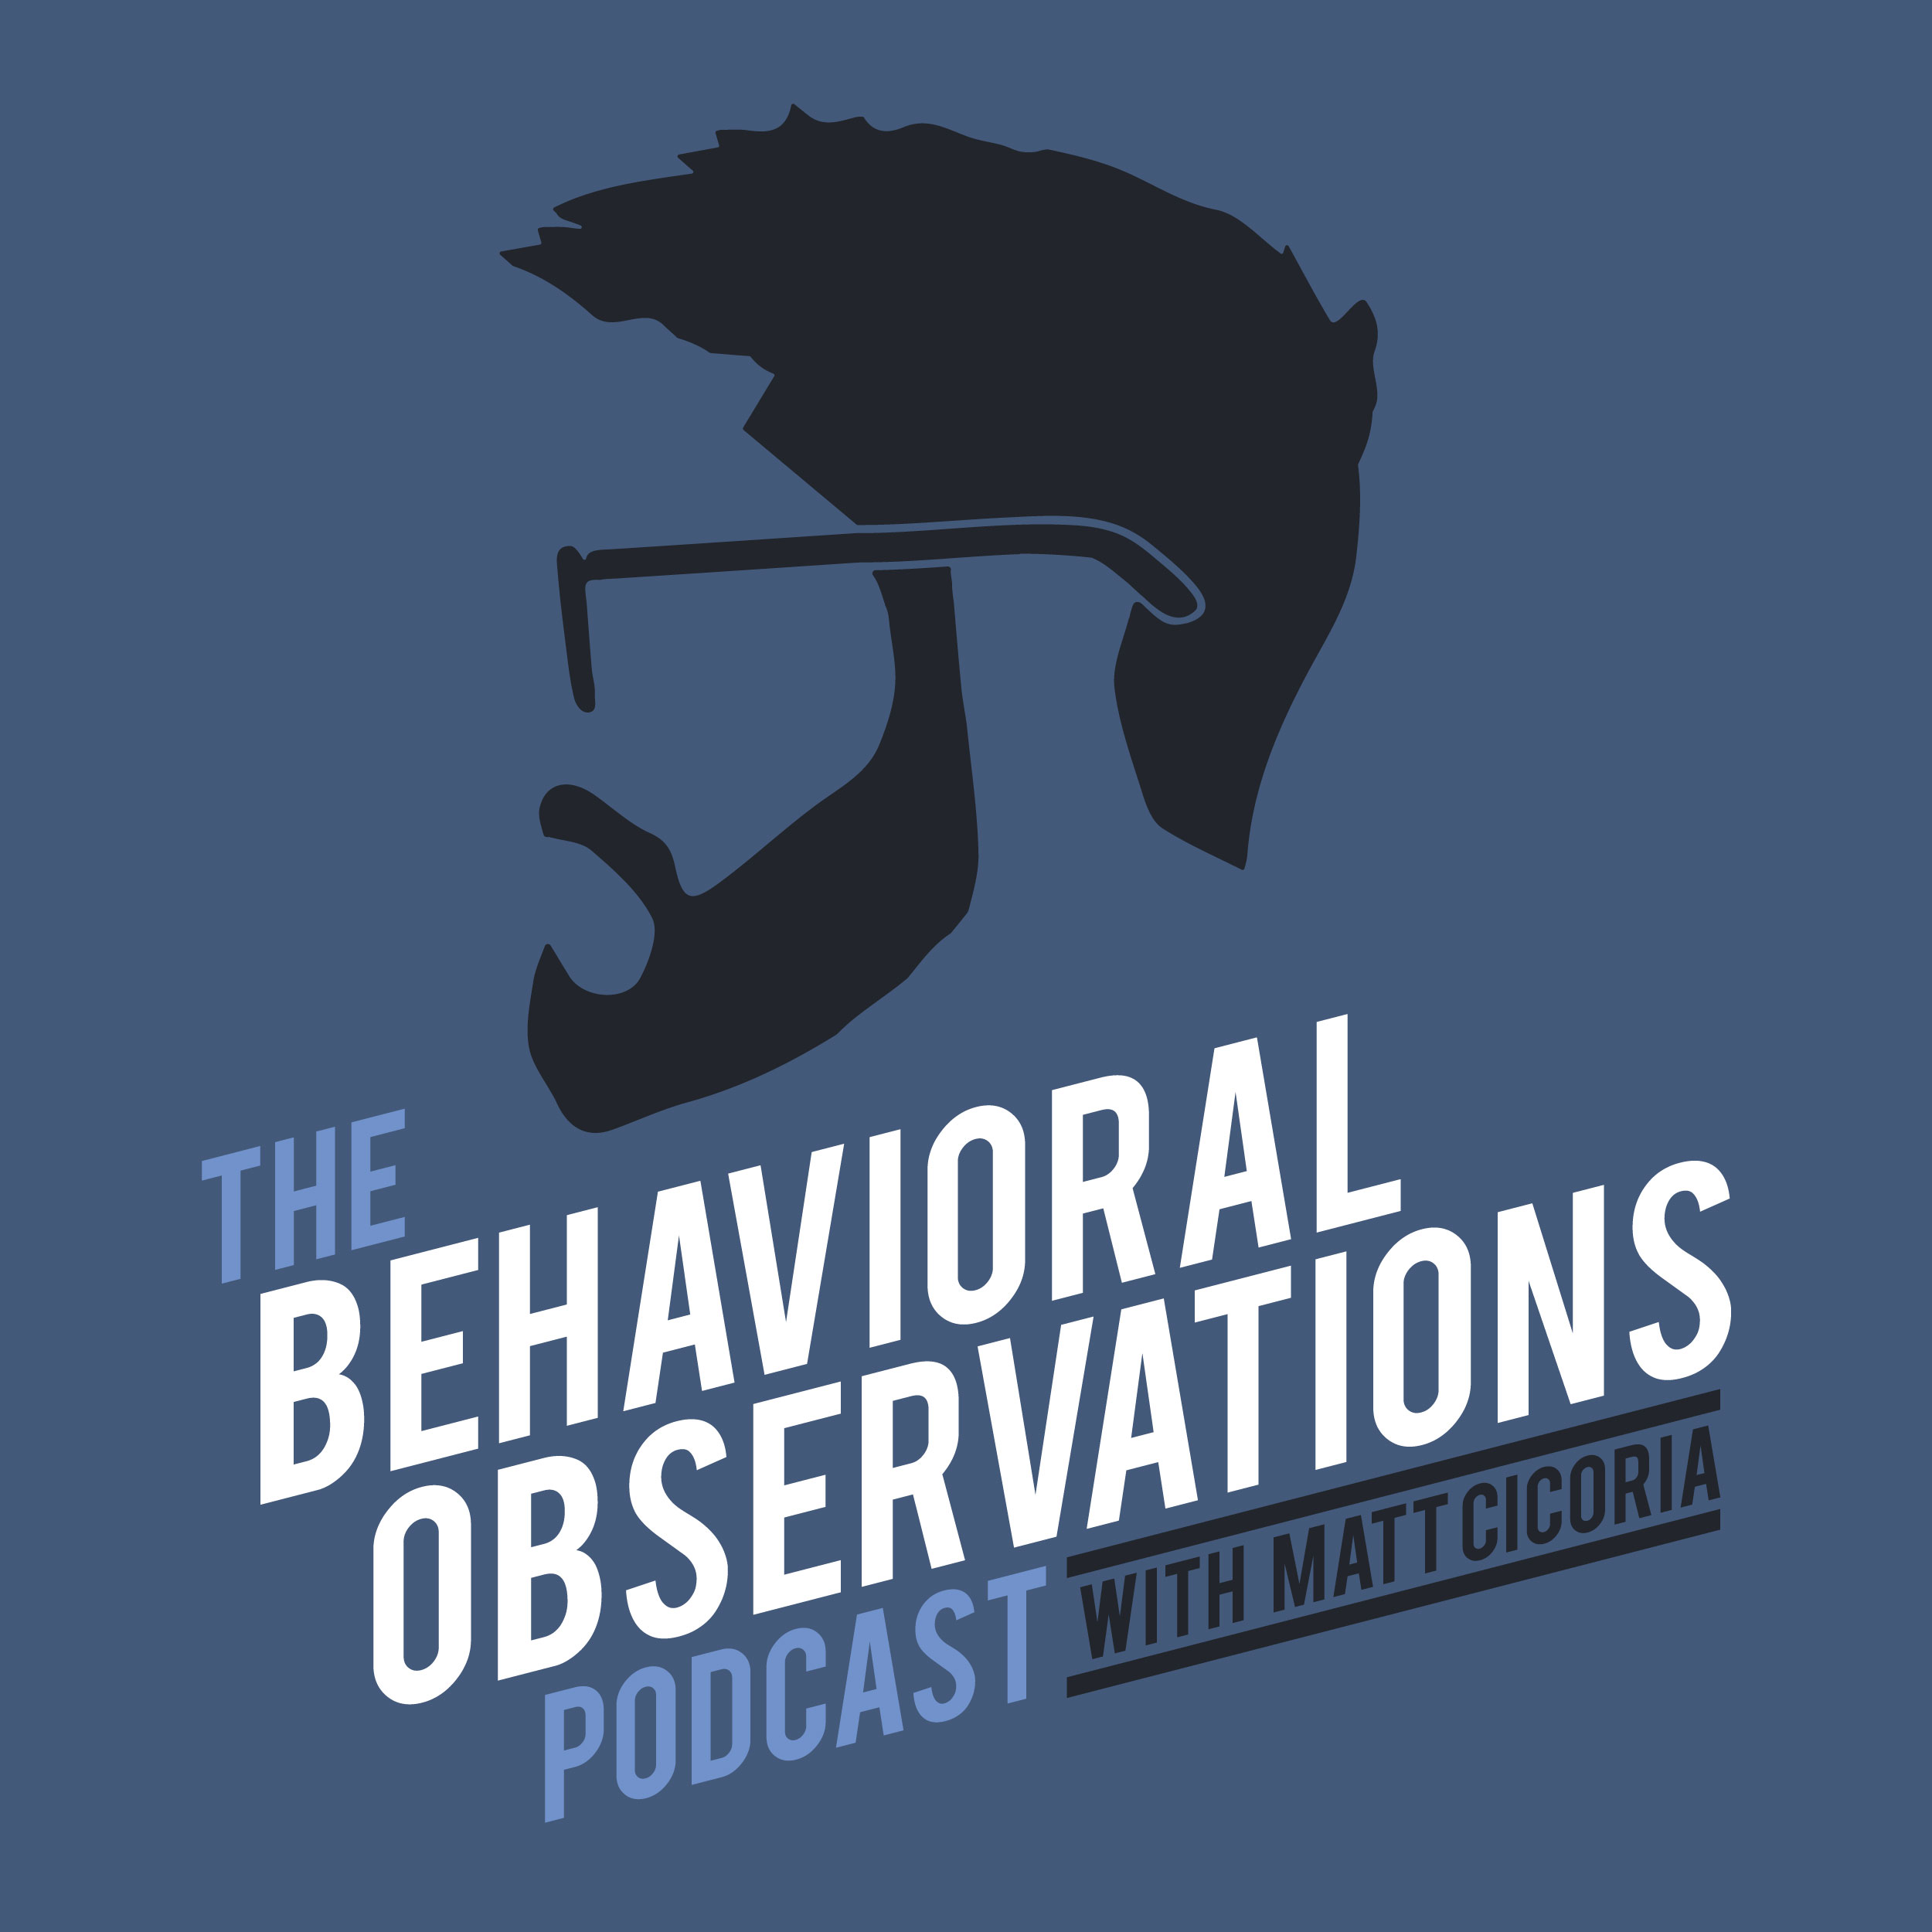 The Behavioral Observations Podcast